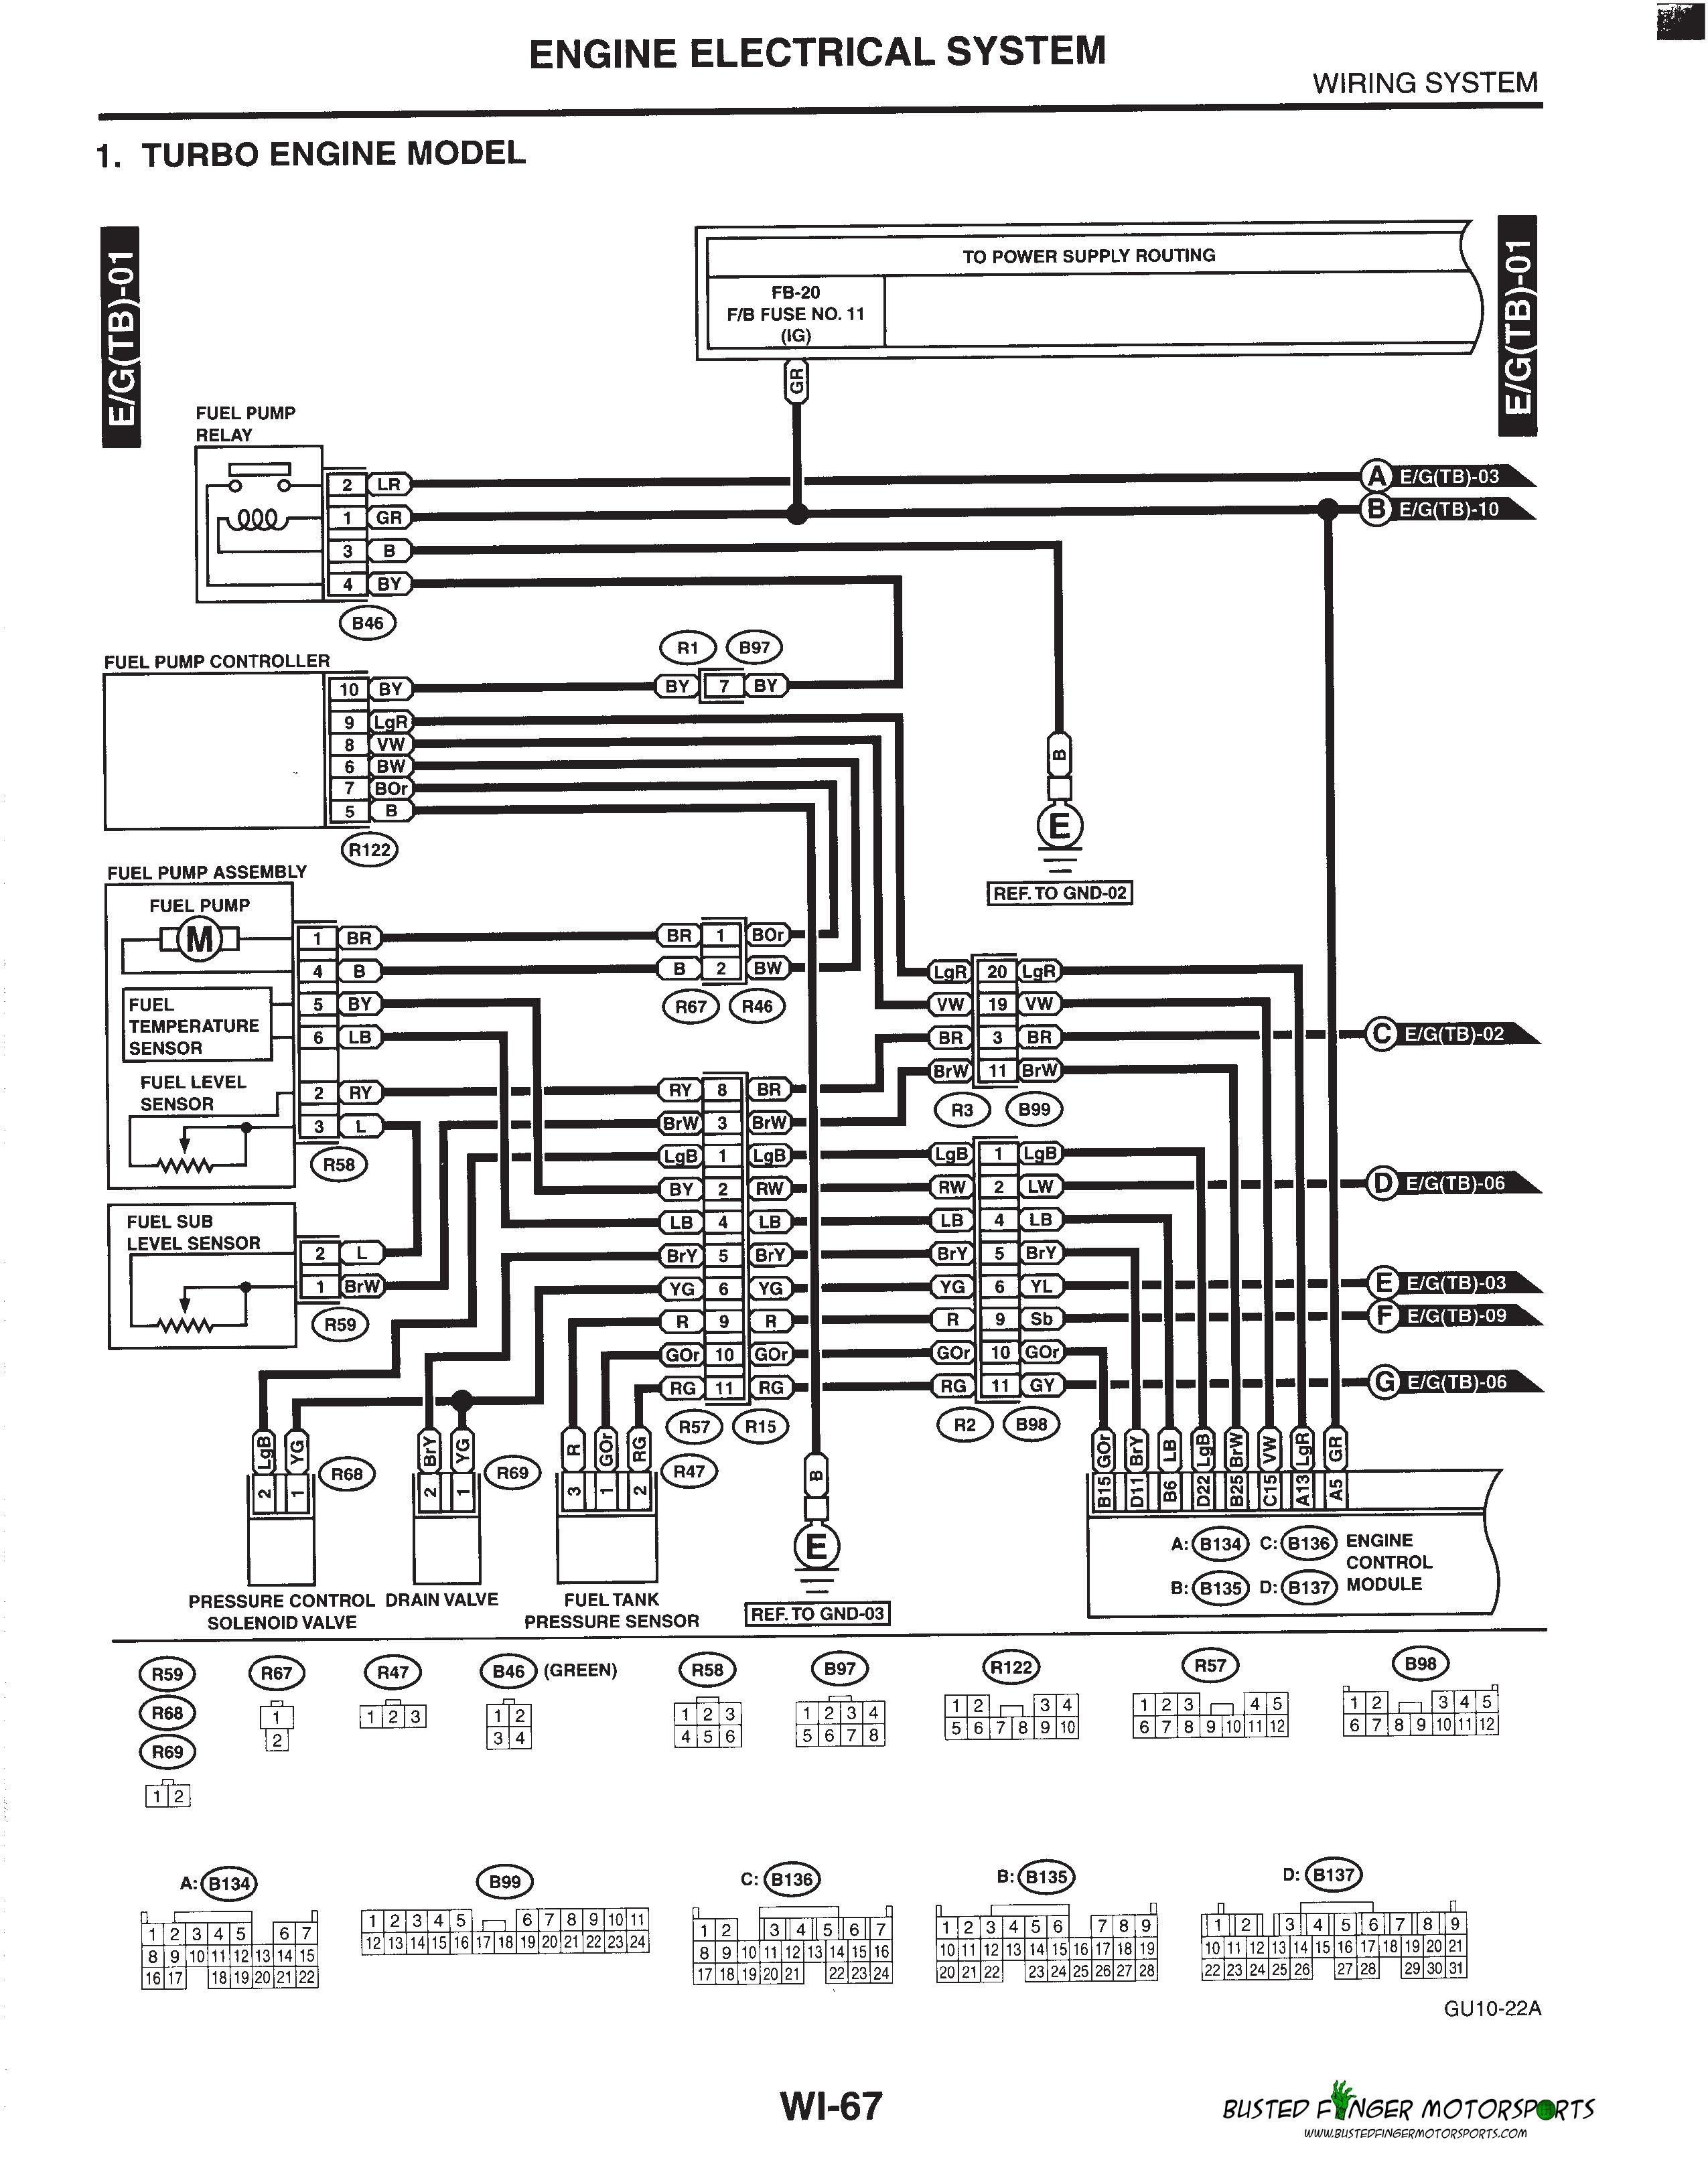 2002 Wrx Wiring Diagram Datsun 2000 Wiring Diagram Bege Wiring Diagram